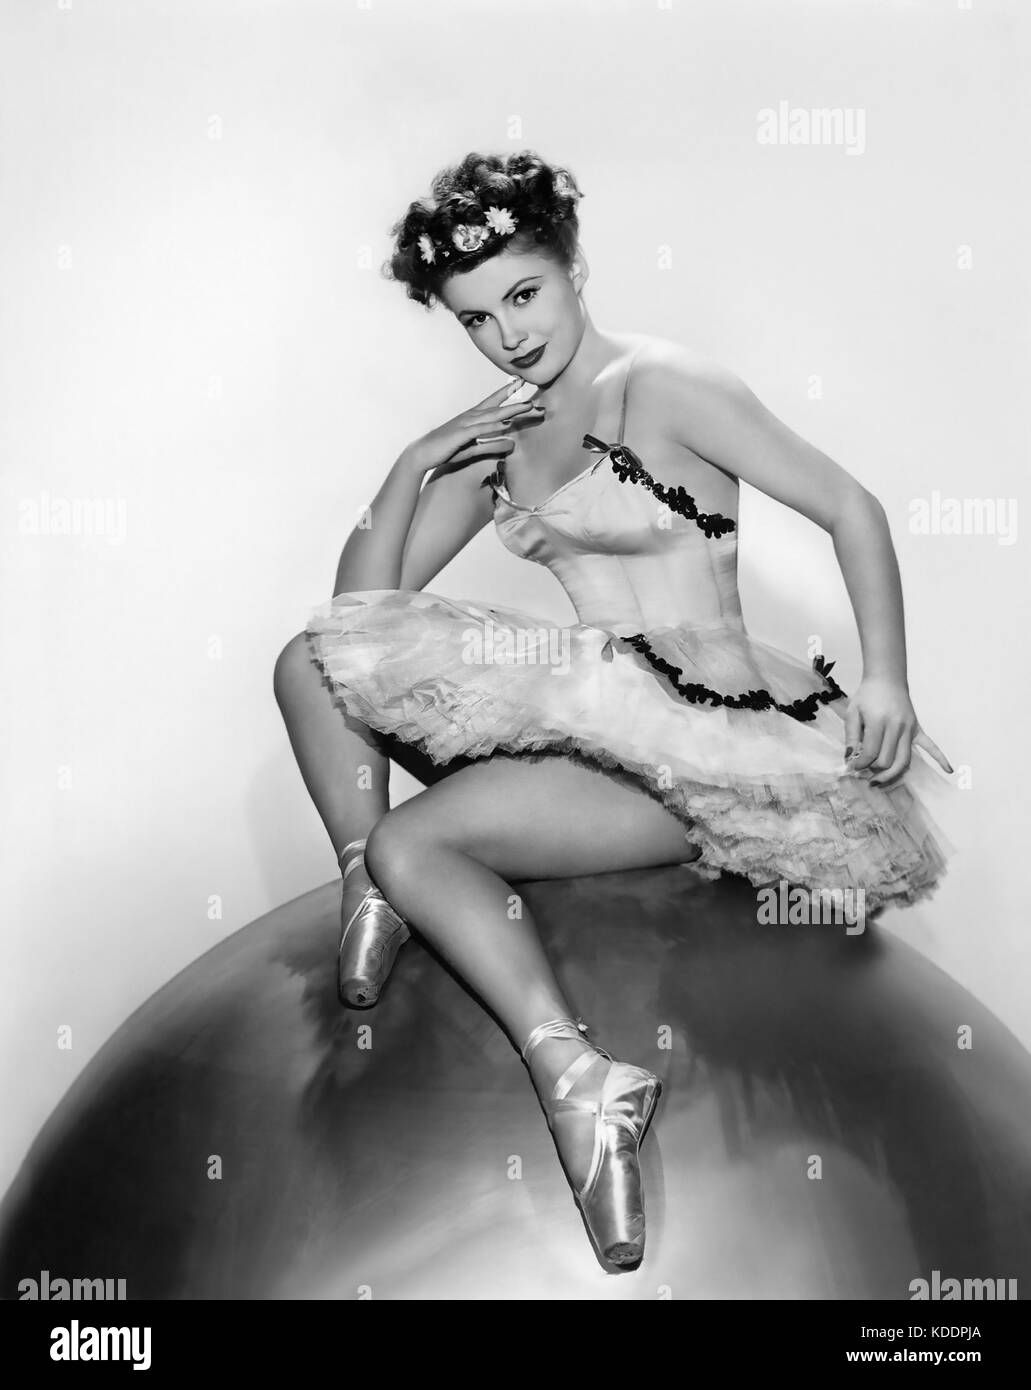 JOAN LESLIE (1925-2015) American film actress and dancer - Stock Image